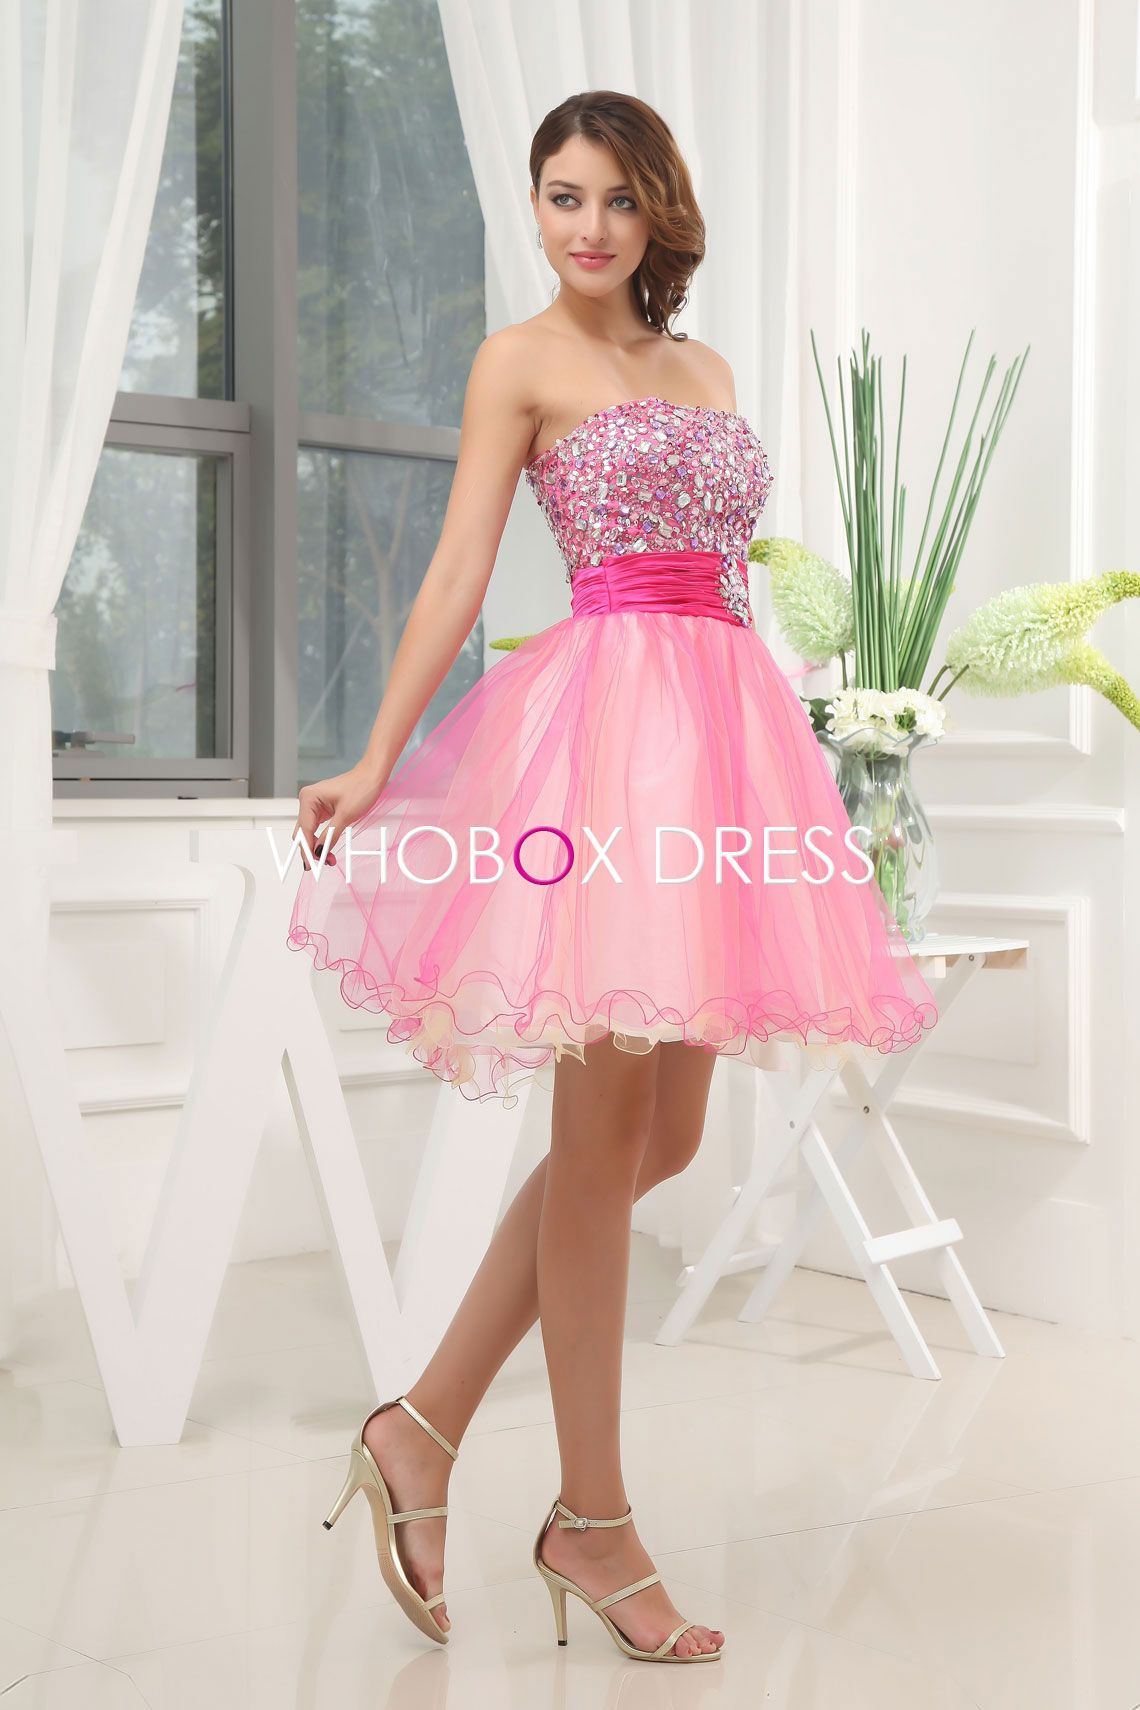 Party Dresses Sweet 16 Dresses Cute Wedding Dress Sweet Sixteen Dresses [ 1710 x 1140 Pixel ]